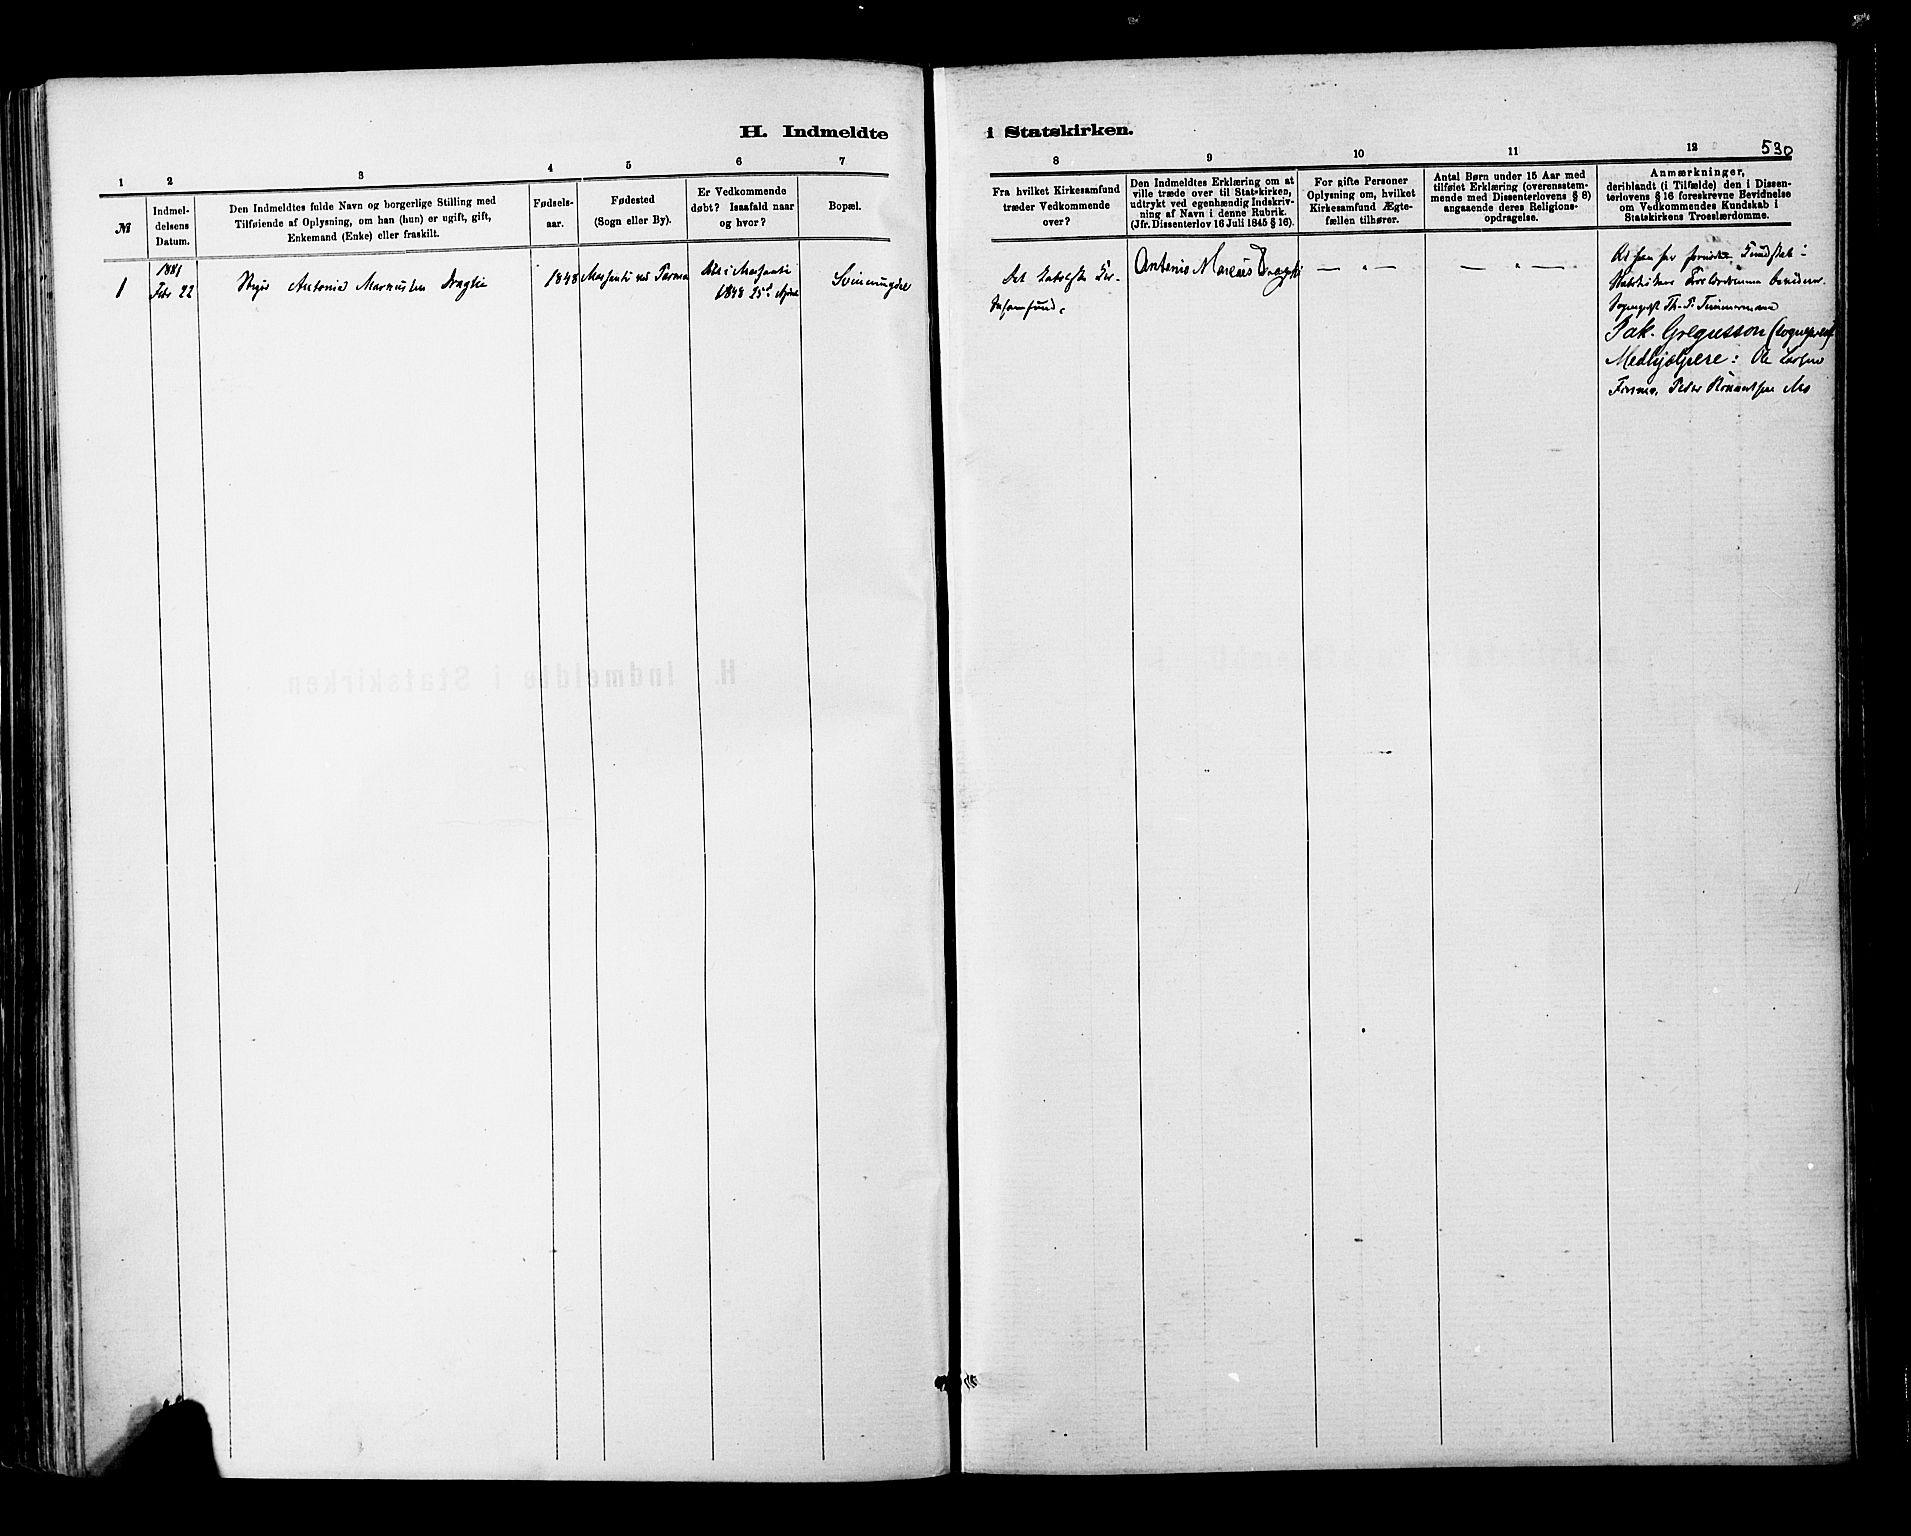 SAT, Ministerialprotokoller, klokkerbøker og fødselsregistre - Nordland, 820/L0295: Ministerialbok nr. 820A16, 1880-1896, s. 530